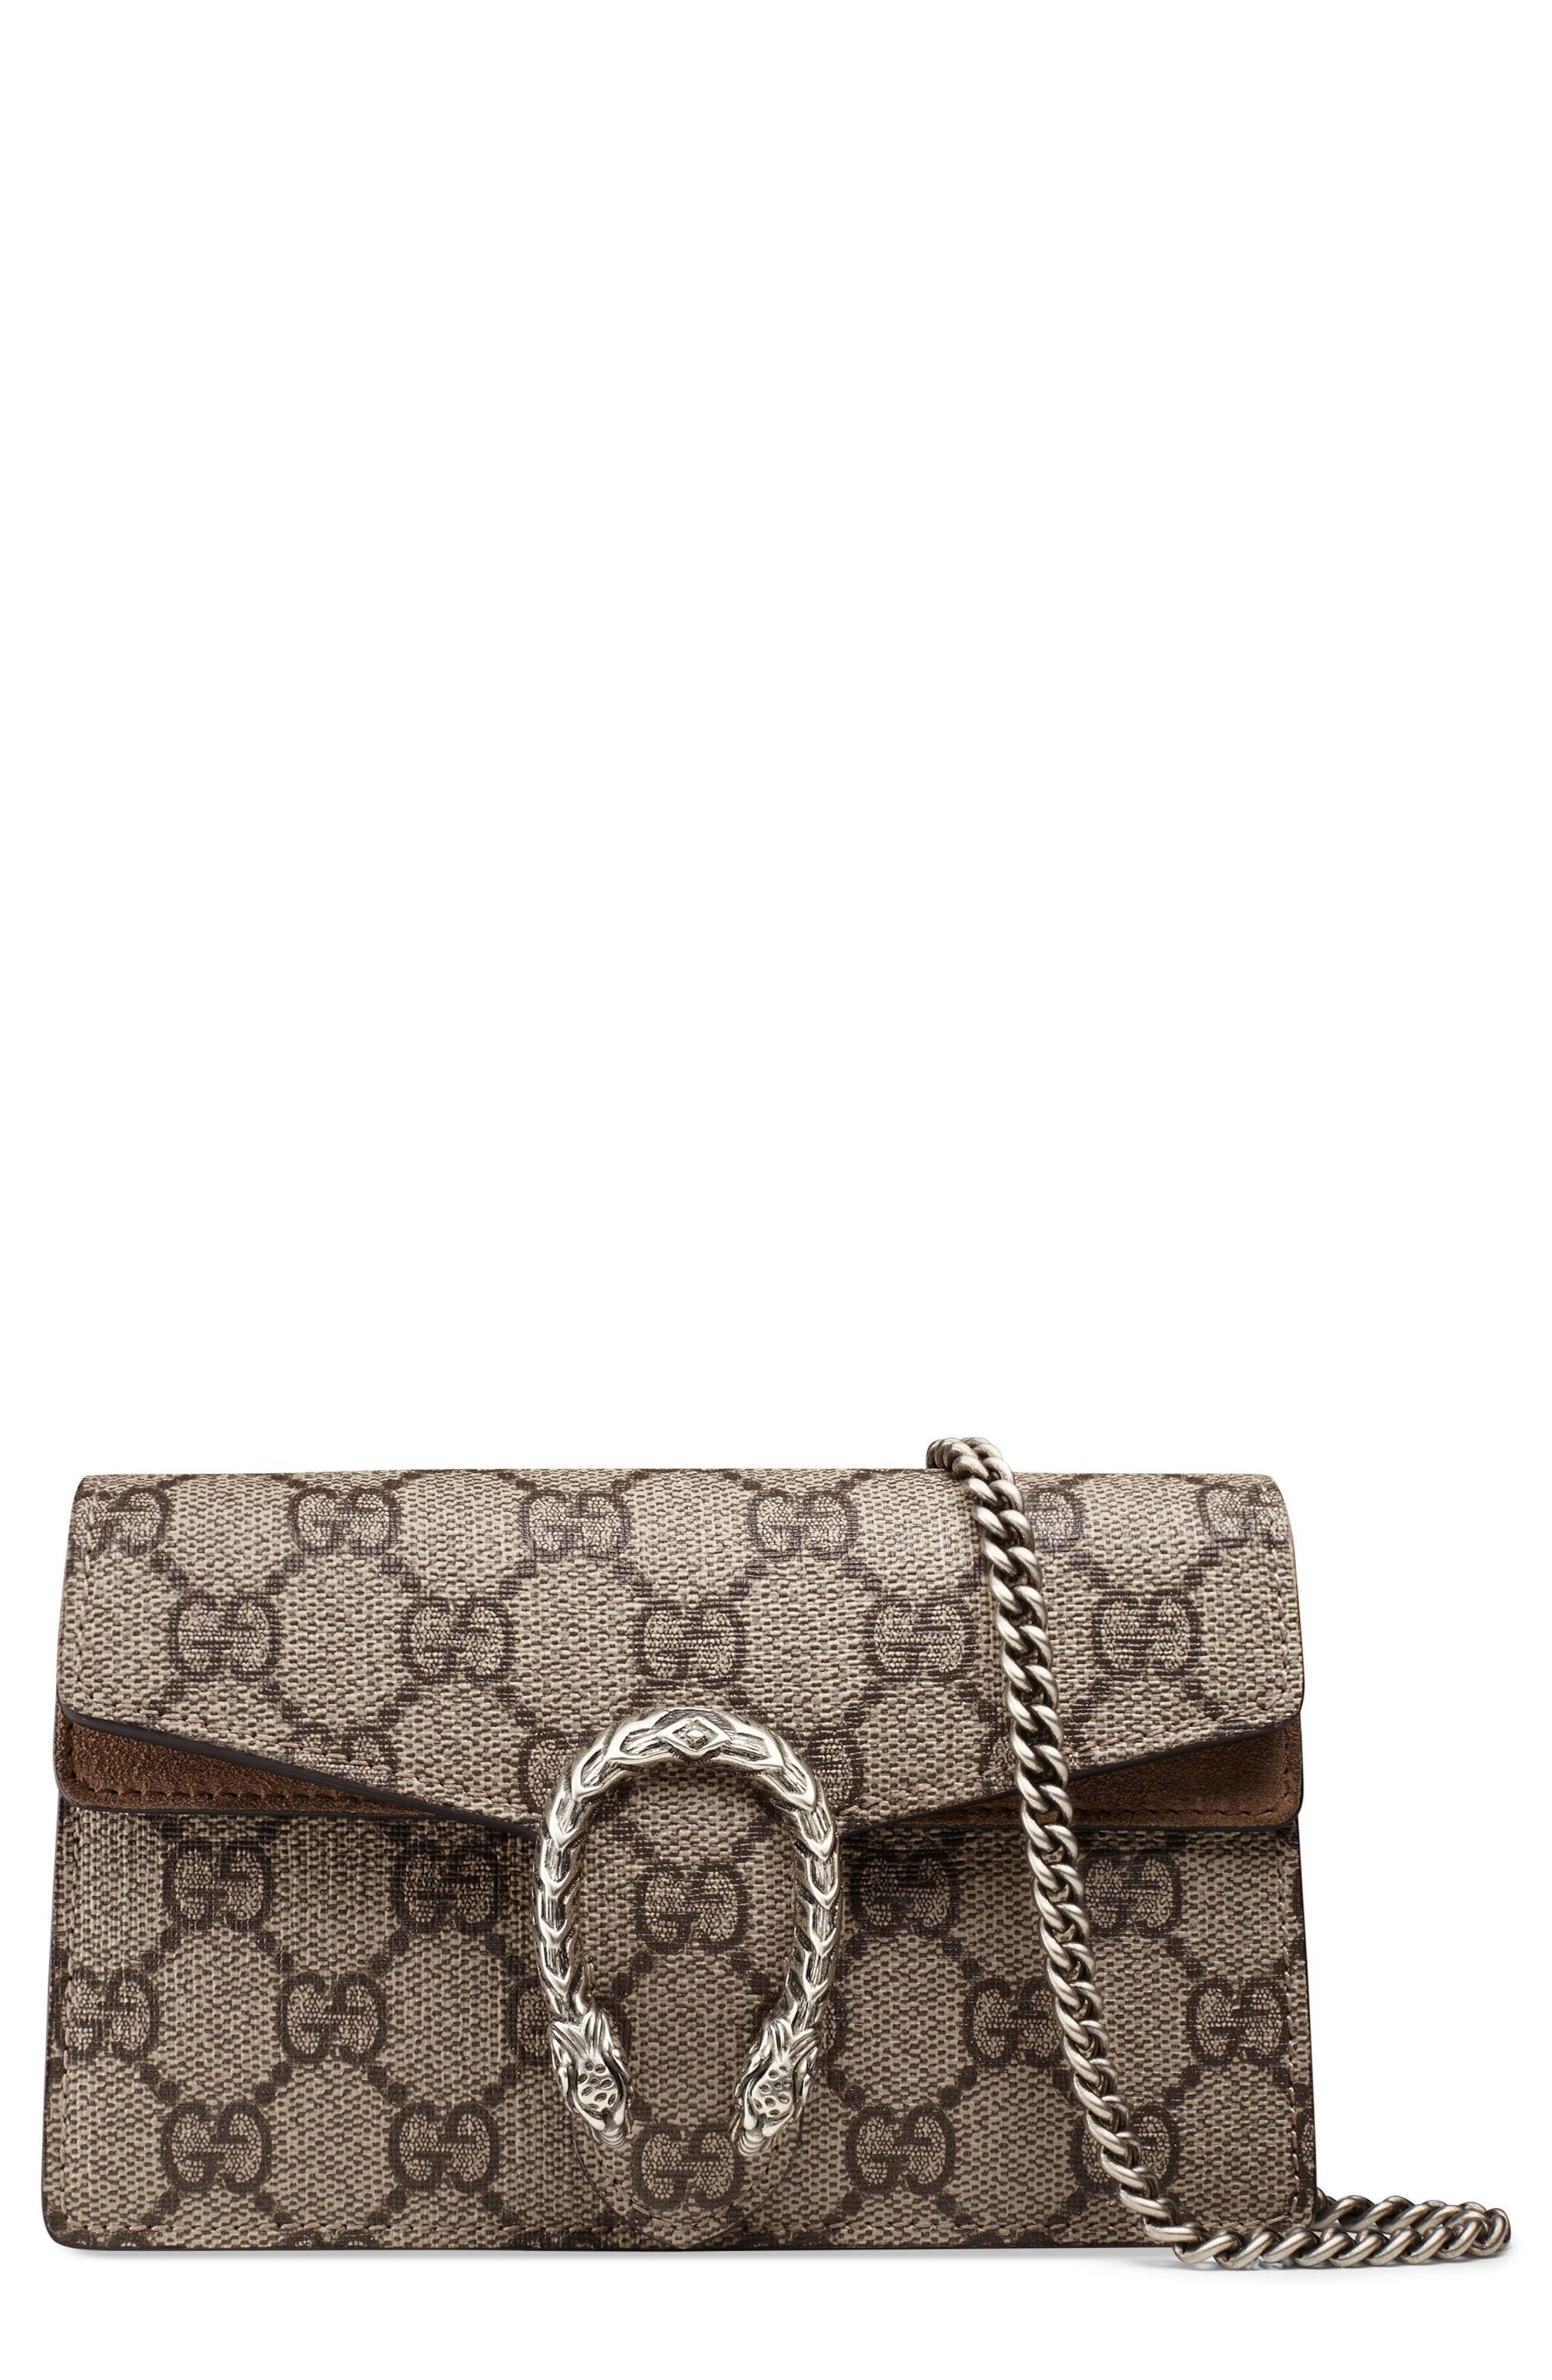 GUCCI, Super Mini Dionysus GG Supreme Canvas & Suede Shoulder Bag, Main thumbnail 1, color, 250